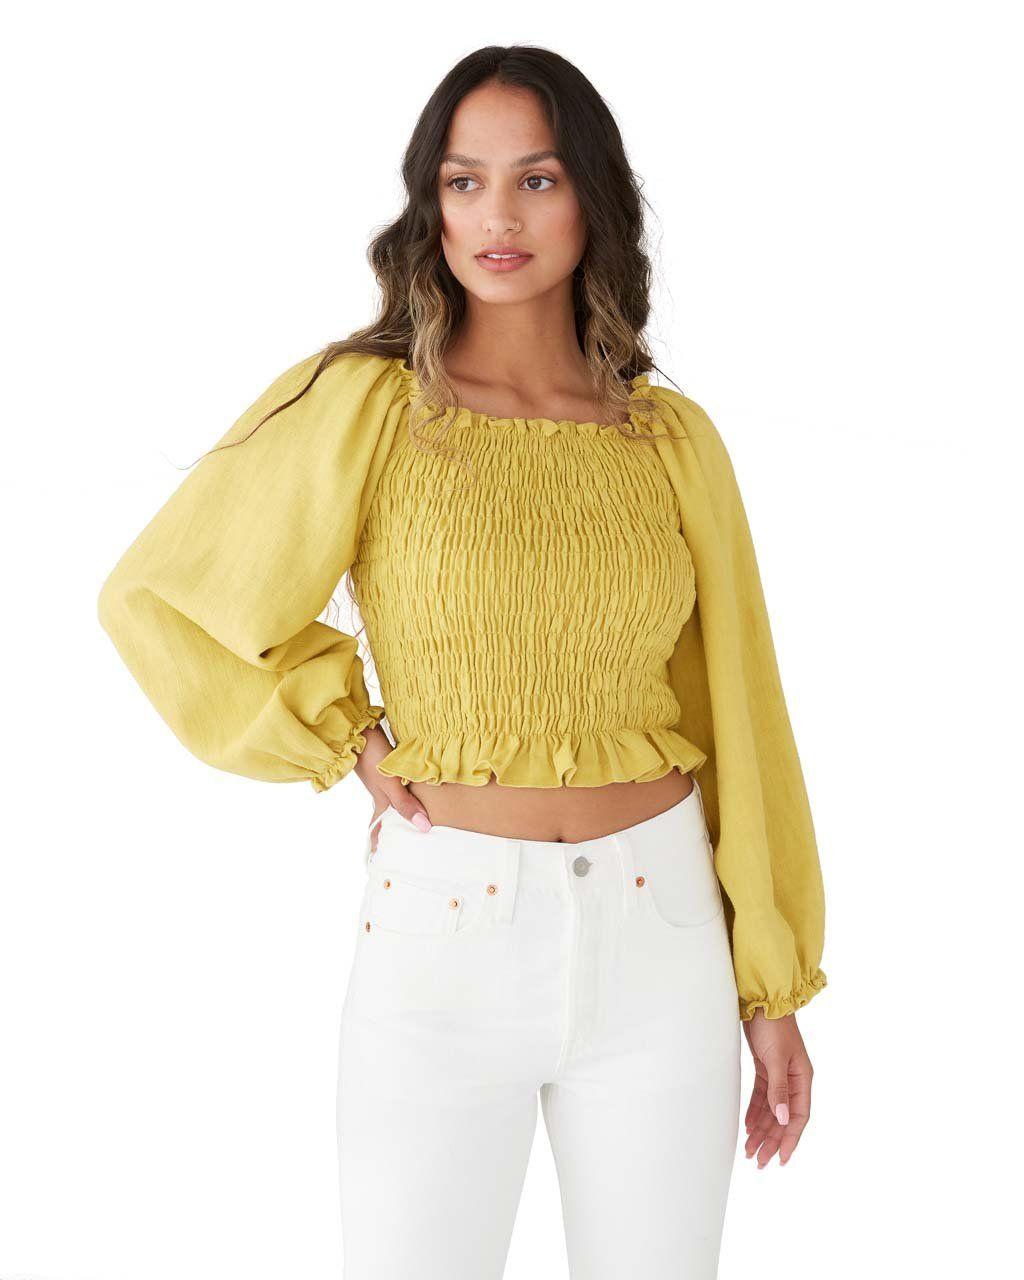 Daisy blouse sunflower by samantha pleet blouse ban